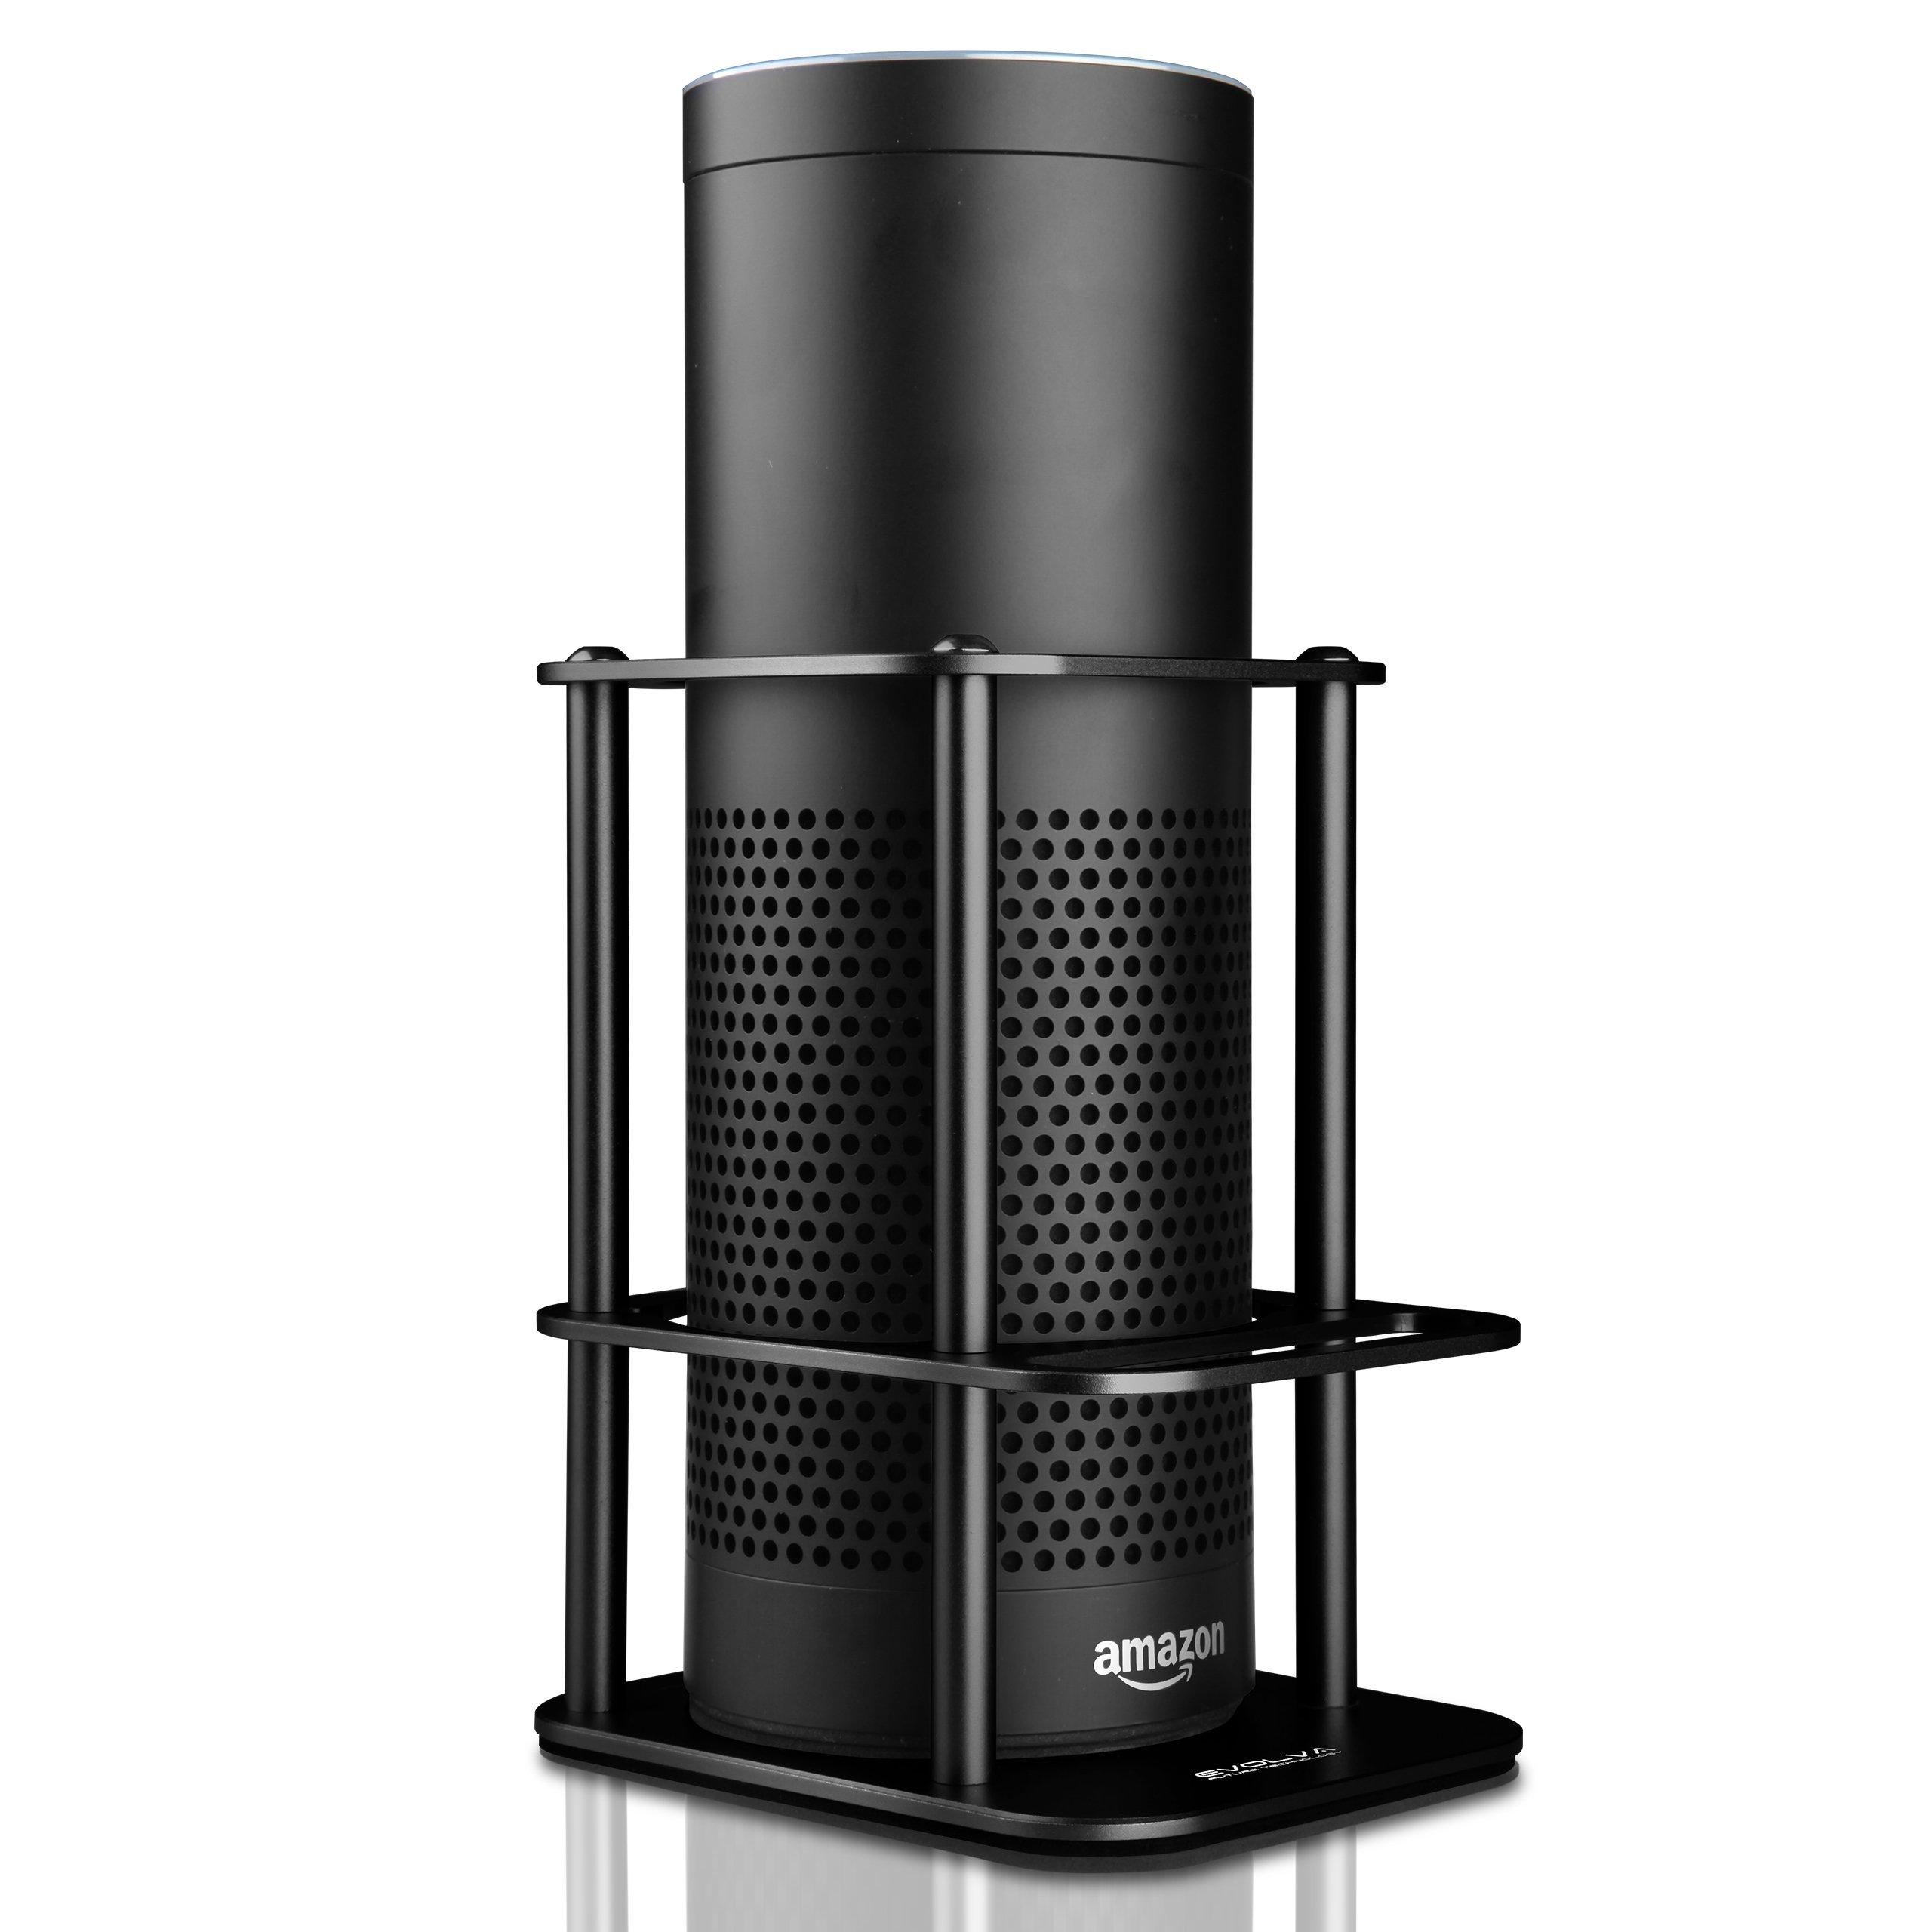 Aluminium Speaker Guard, Sturdy and, Evolva Future Technology Speaker Stand for Amazon Echo and UE MEGABOOM, Safe Guard Holder for your Alexa, Pen, Alexa Remote, Mobile Phone (Jet Black)